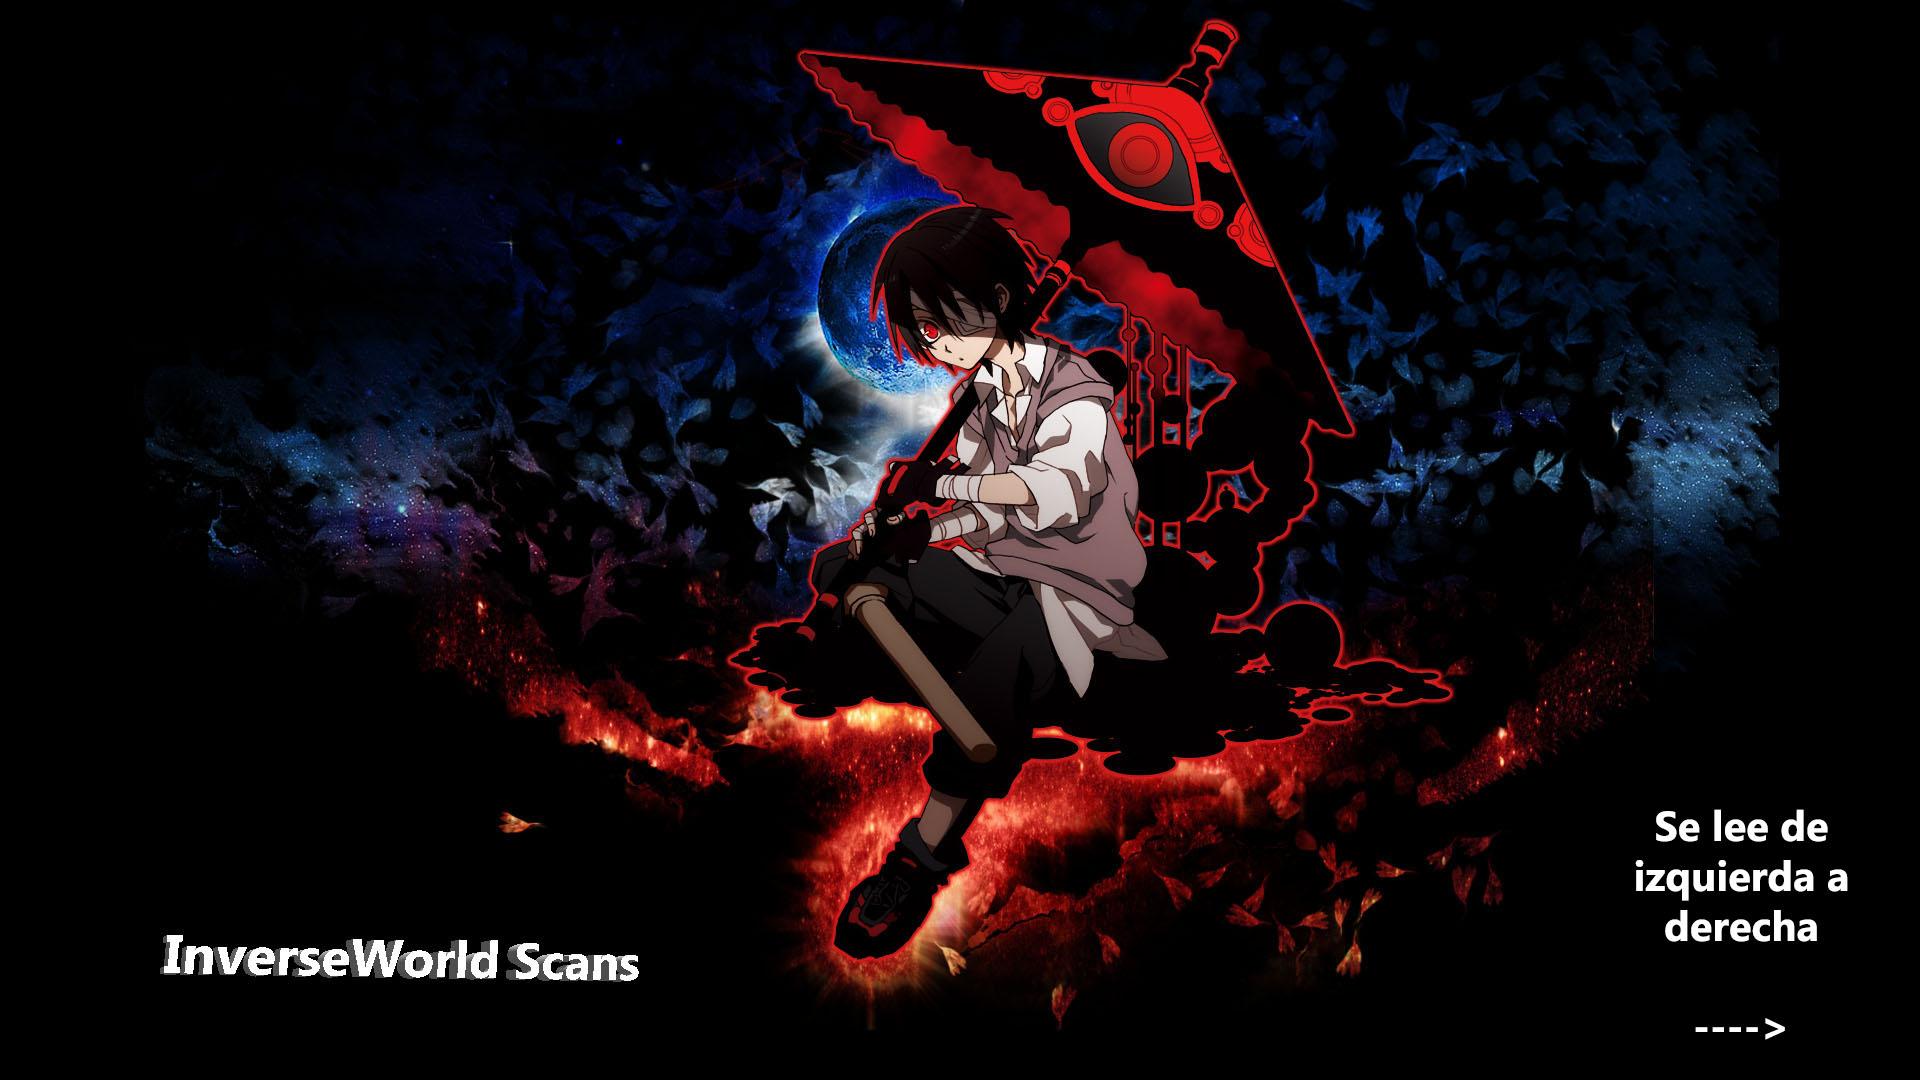 https://c5.mangatag.com/es_manga/18/16210/391364/650cfd773949162abff9d025cc7497ab.jpg Page 1